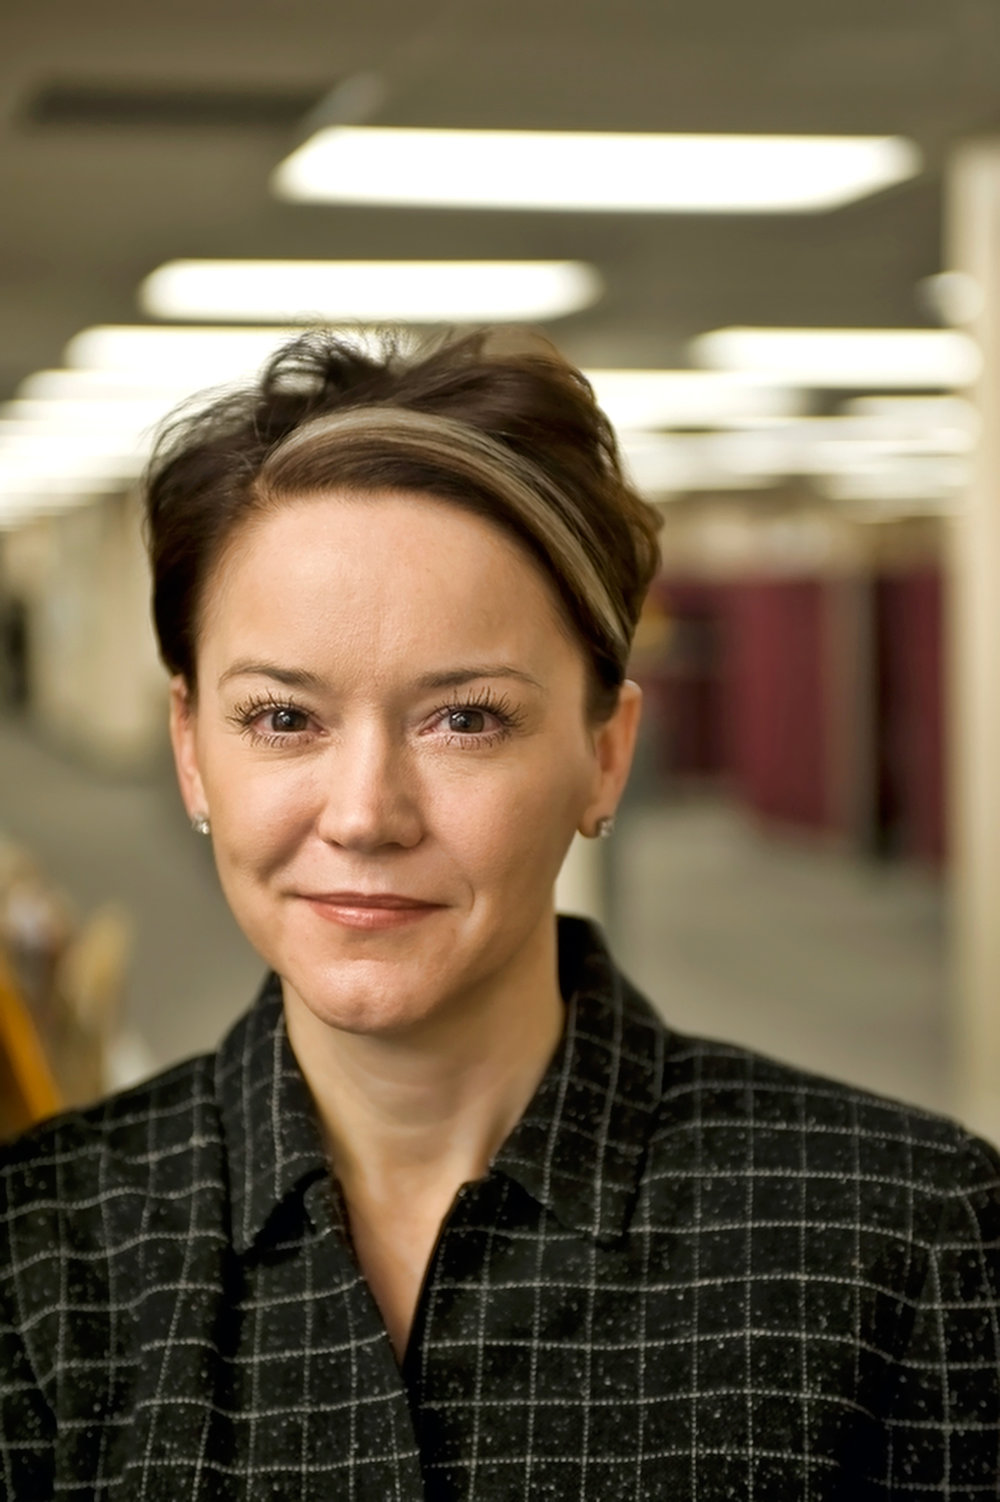 Deborah Gist, Superintendent of Tulsa Public Schools